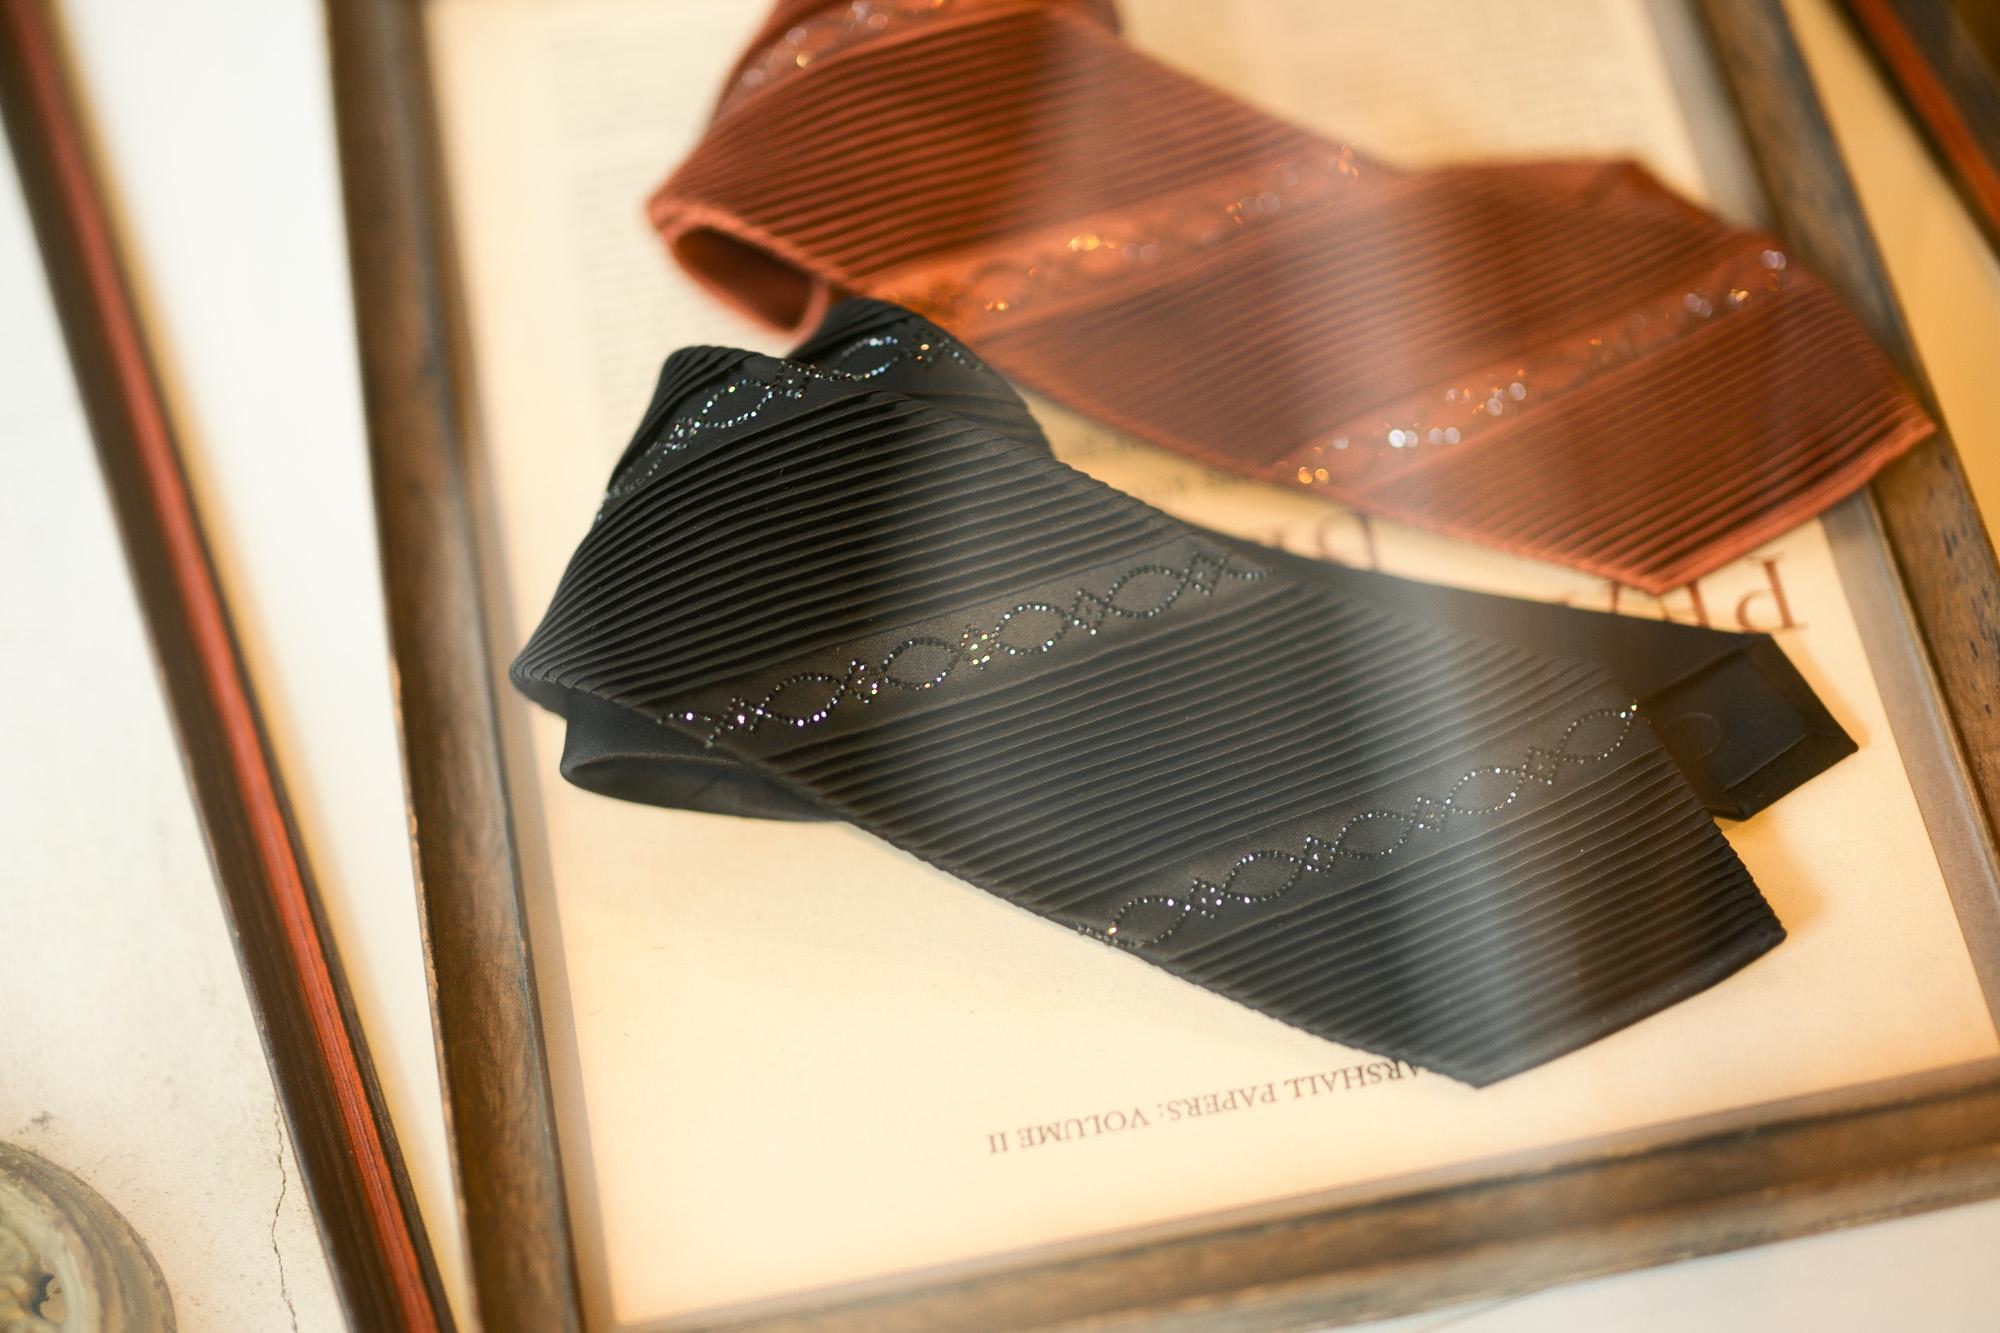 STEFANO RICCI (ステファノリッチ) SWAROVSKI PLEATS TIE (スワロフスキー プリーツタイ) プリーツ ネクタイ BLACK(ブラック),BROWN(ブラウン) Made in italy (イタリア製) 2019 春夏新作 【Special Model】 stefanoricci 愛知 名古屋 altoediritto アルトエデリット